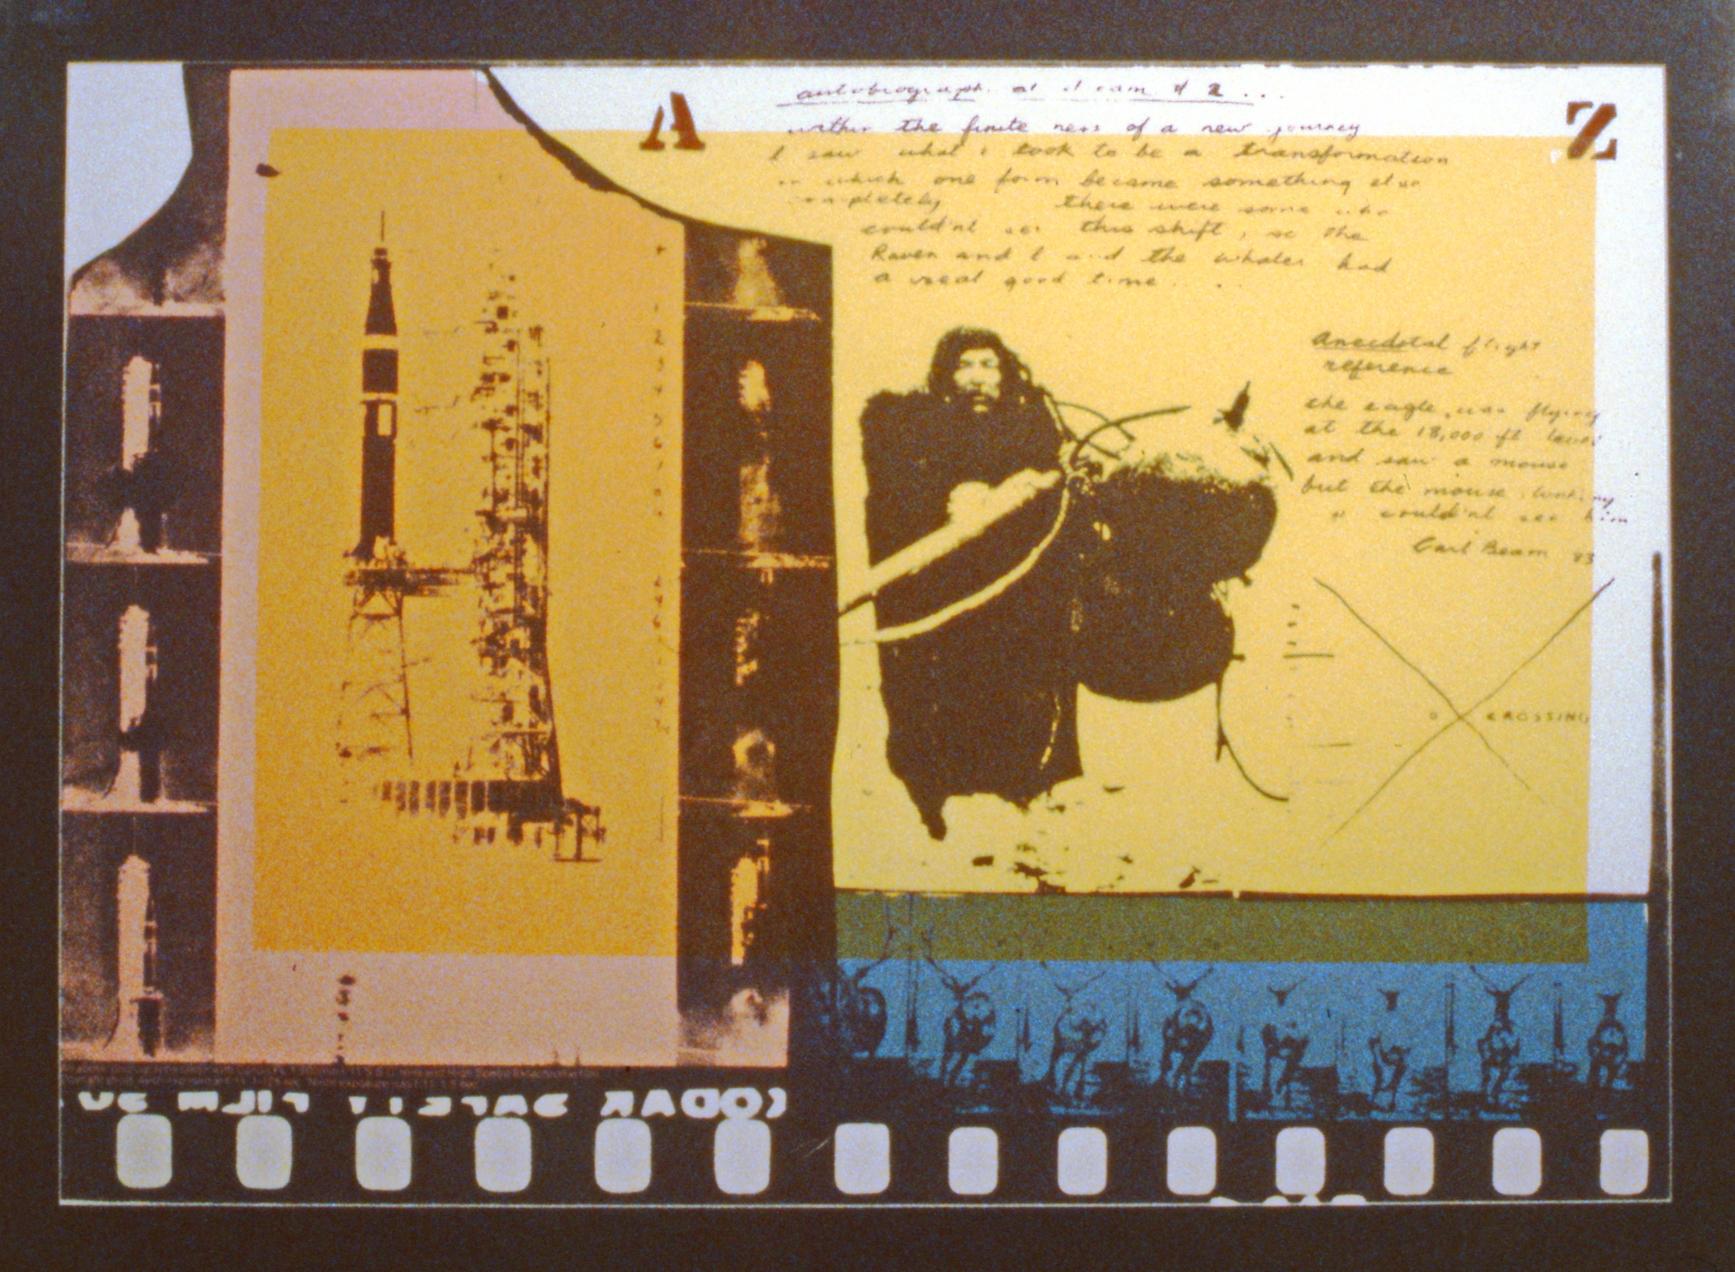 "West Coast Transformation #2 , 1983, Carl Beam, photo silk screen, edition 58/114, 24""x 31 1/2"", 1986.11.01."